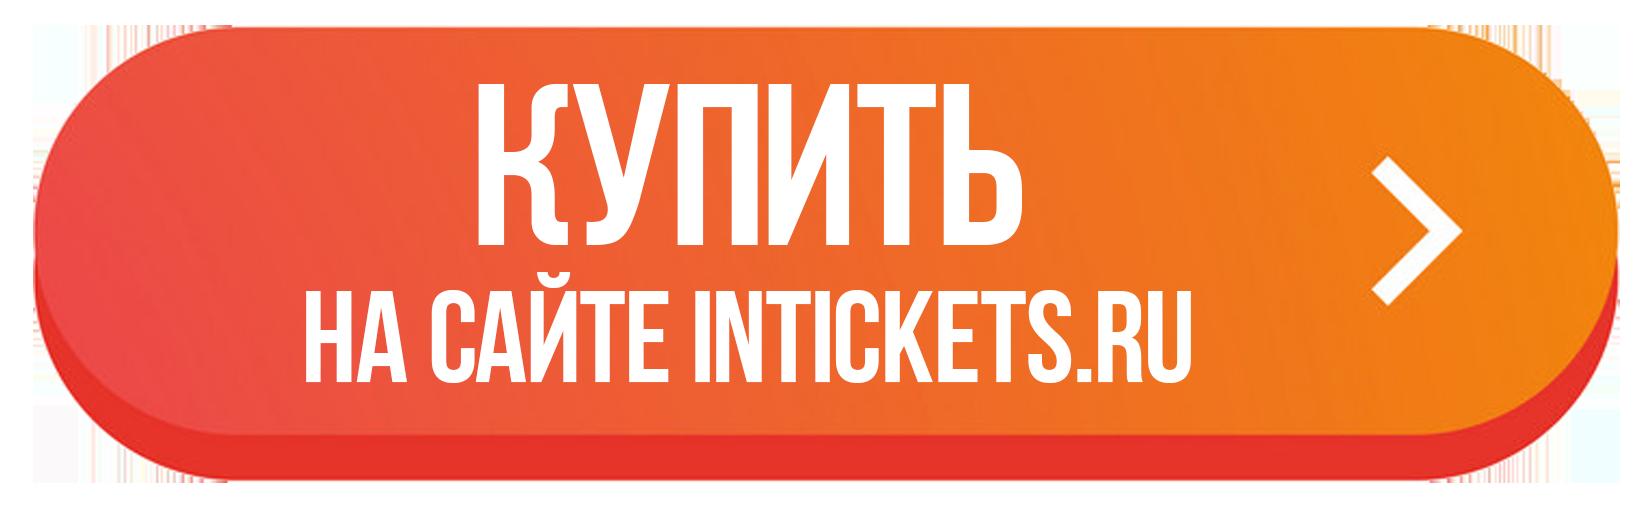 Кнопка для перехода на страницу покупки билетов онлайн с сайта intickets.ru